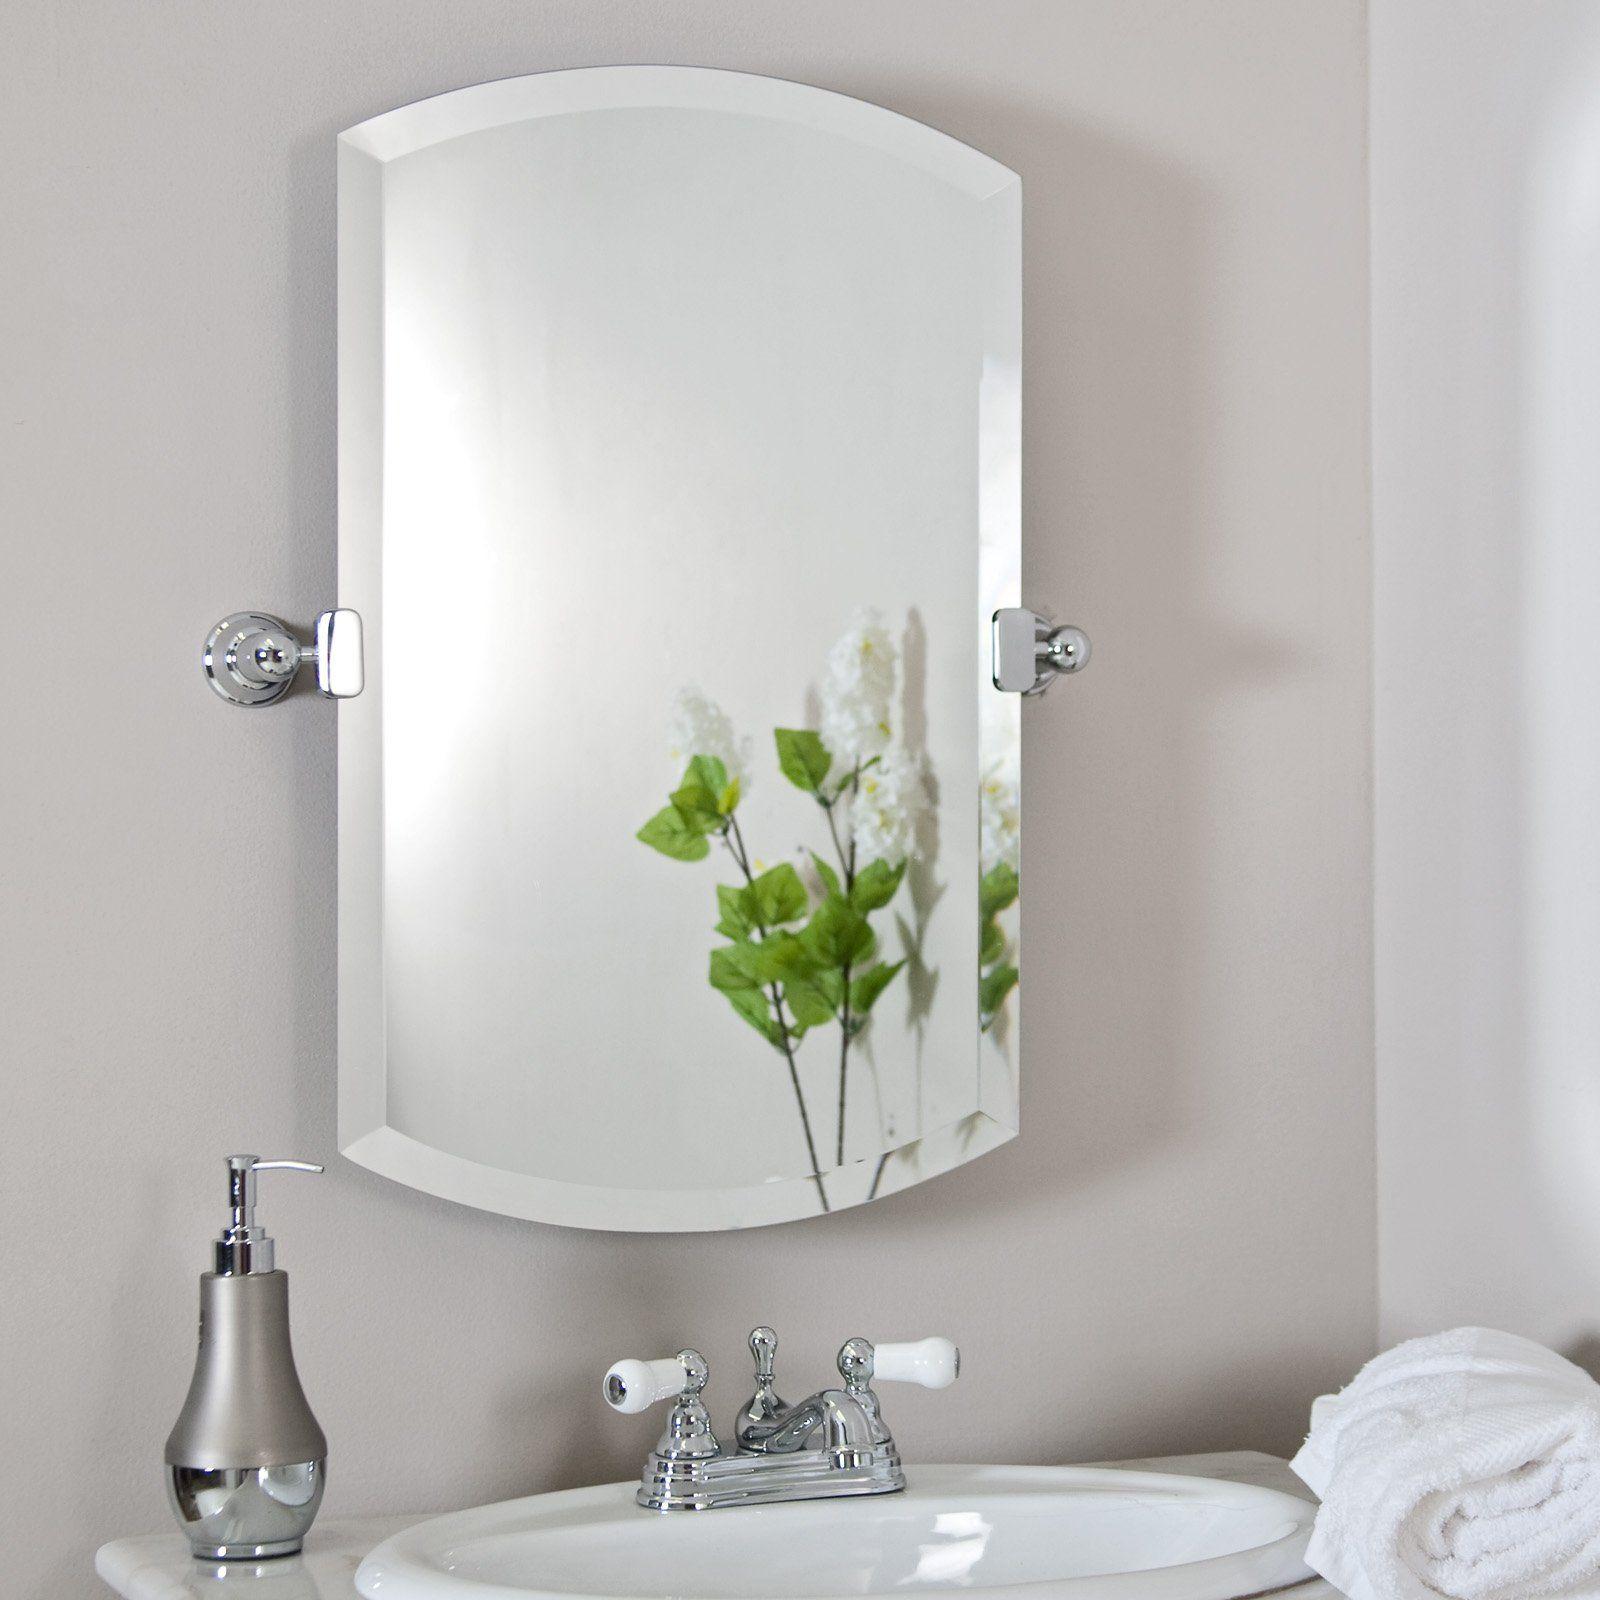 1000 images about bathroom on pinterest bathroom mirrors vanities and mirror bathroom mirrors